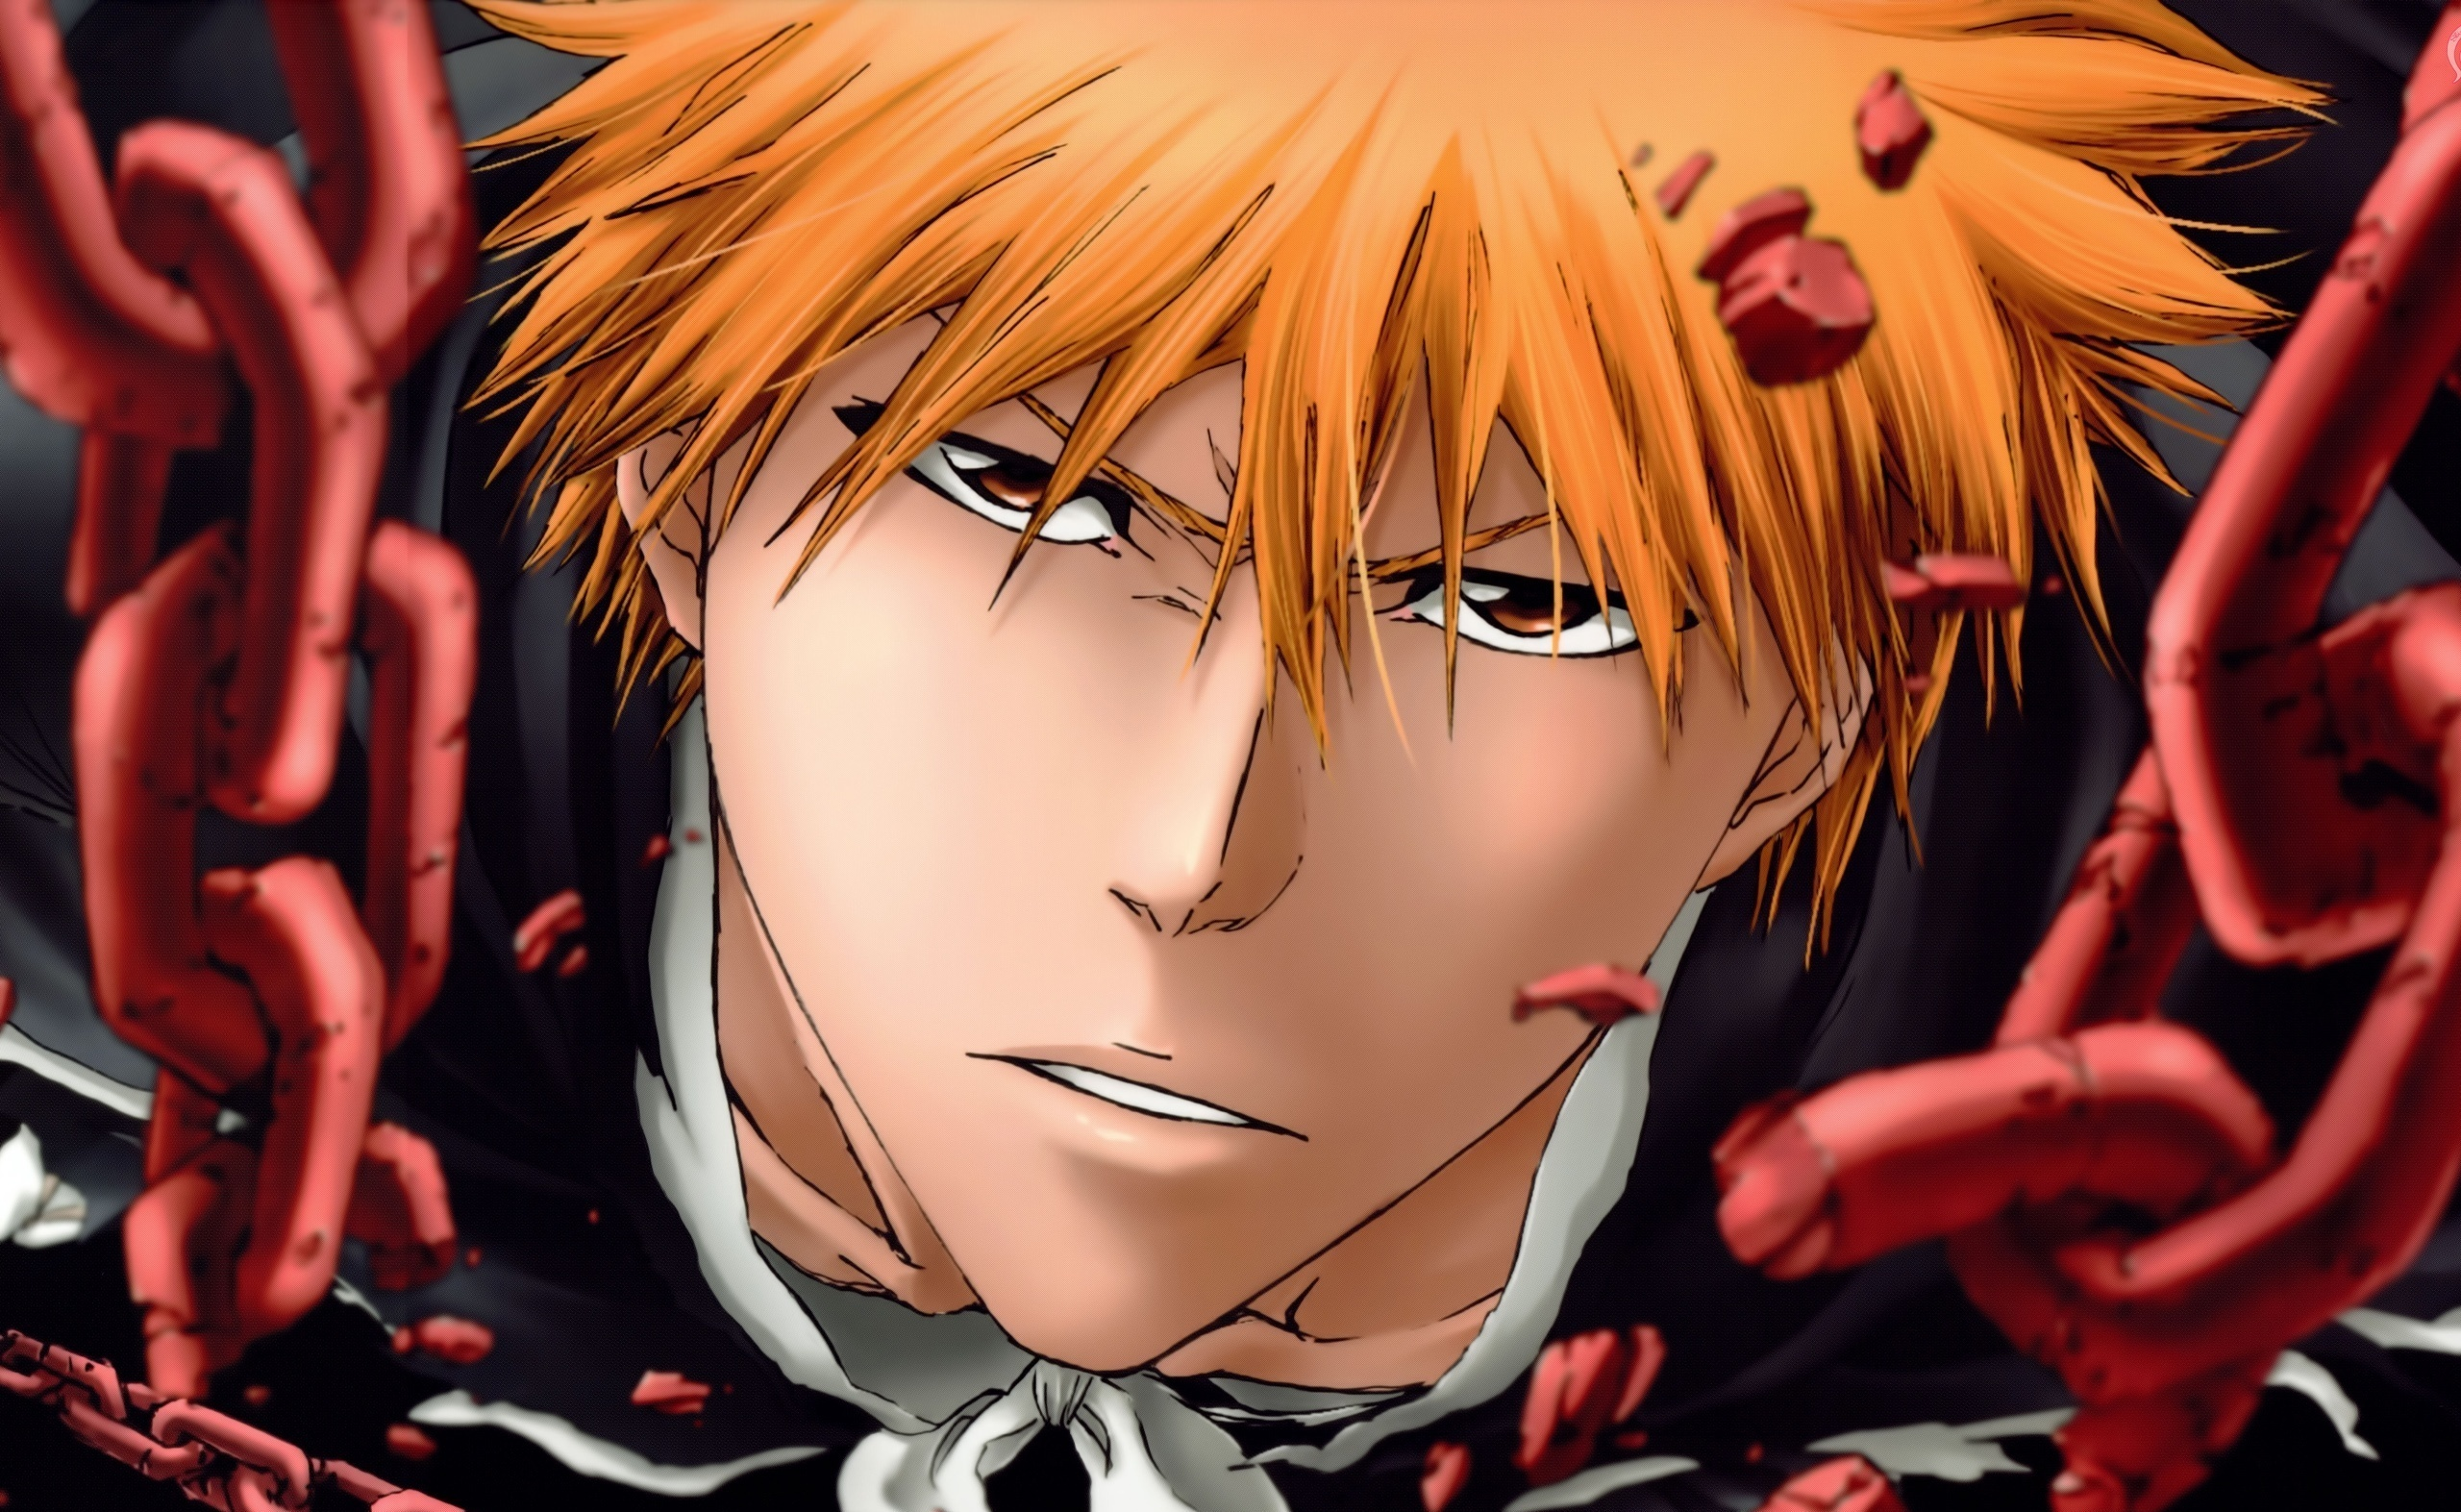 bleach, art, kurosaki ichigo Wallpaper, HD Anime 4K ...